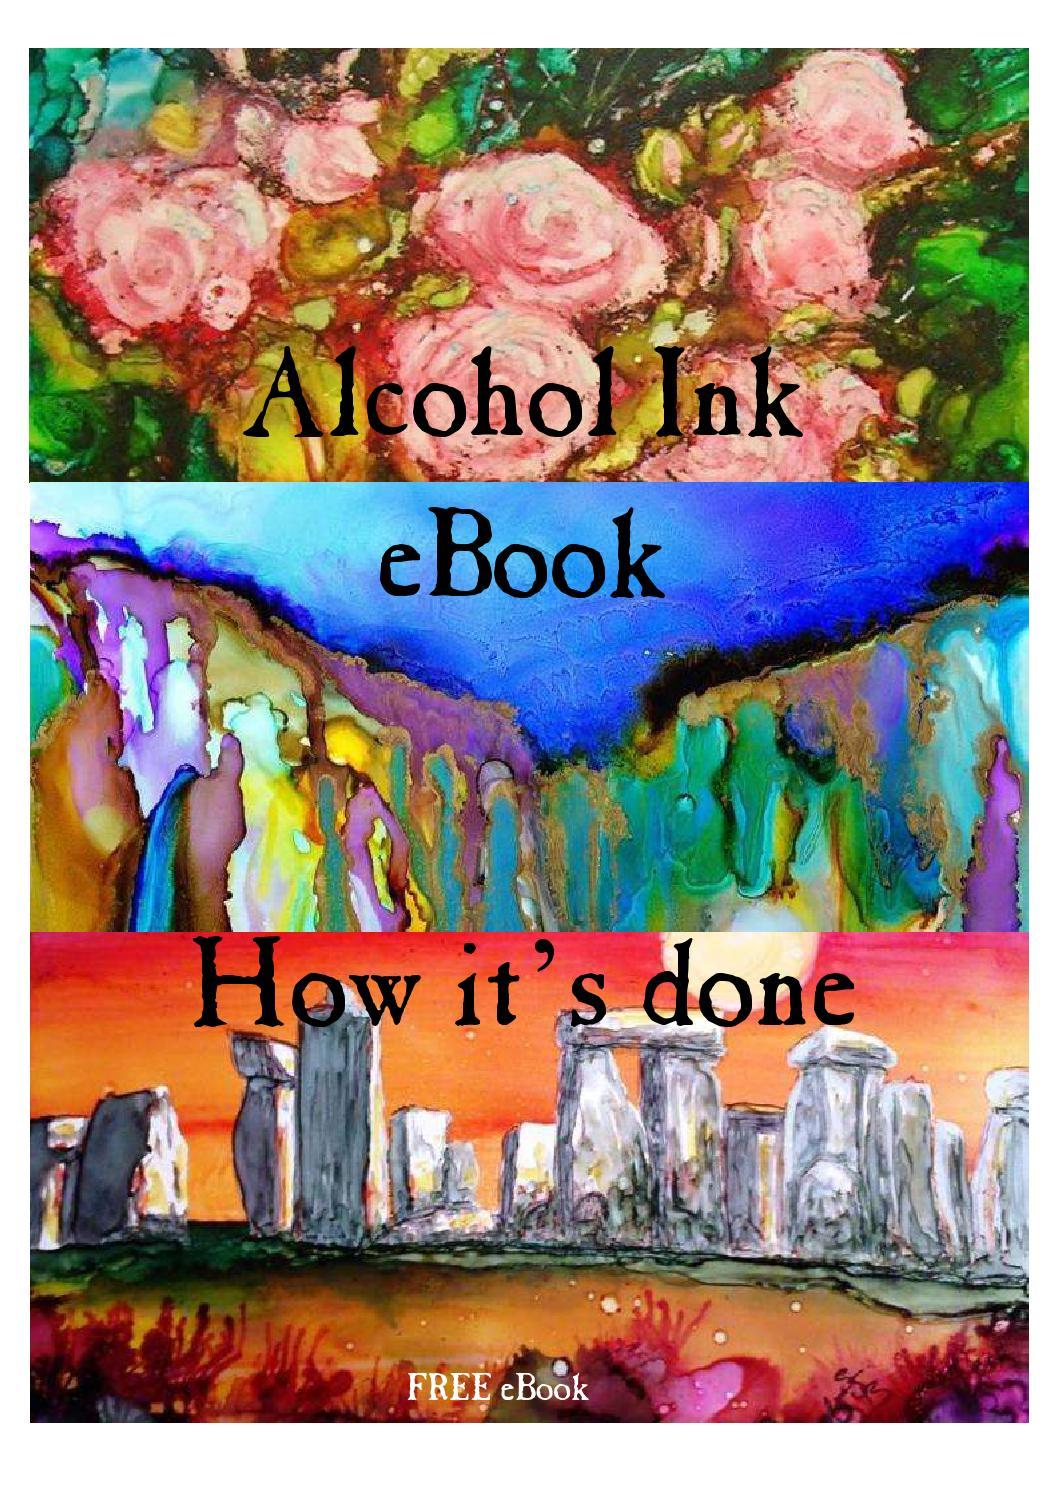 Free alcohol ink ebook how it s done by nancy murphree davis issuu baditri Images